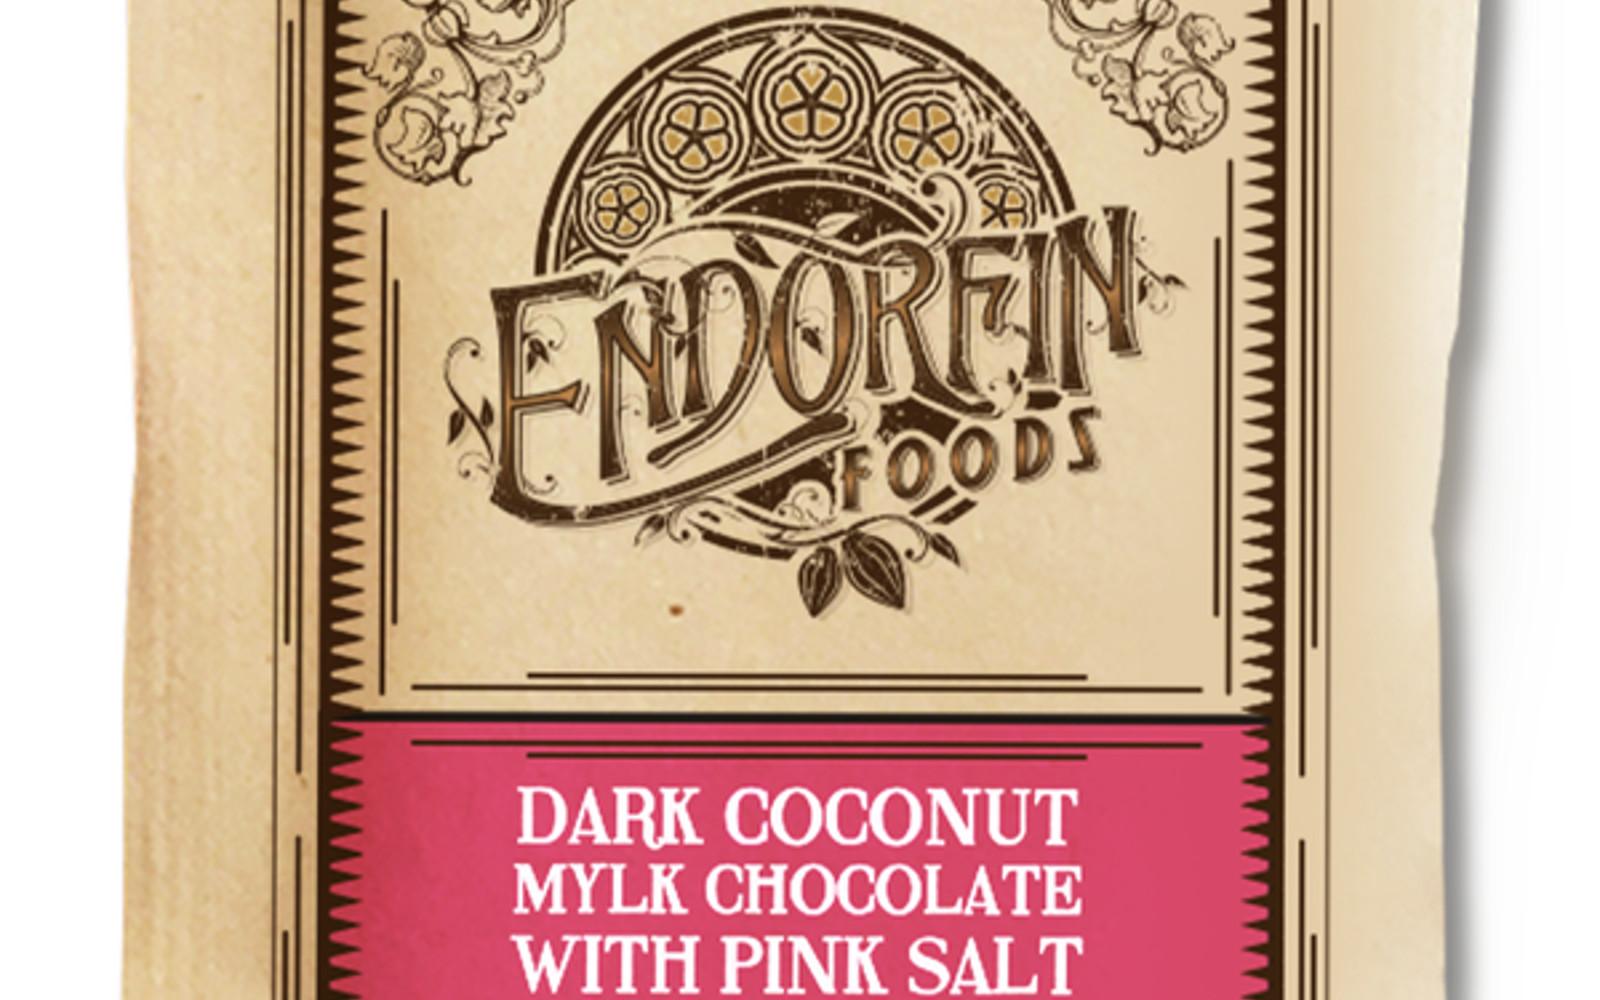 Chocolate Endorfin